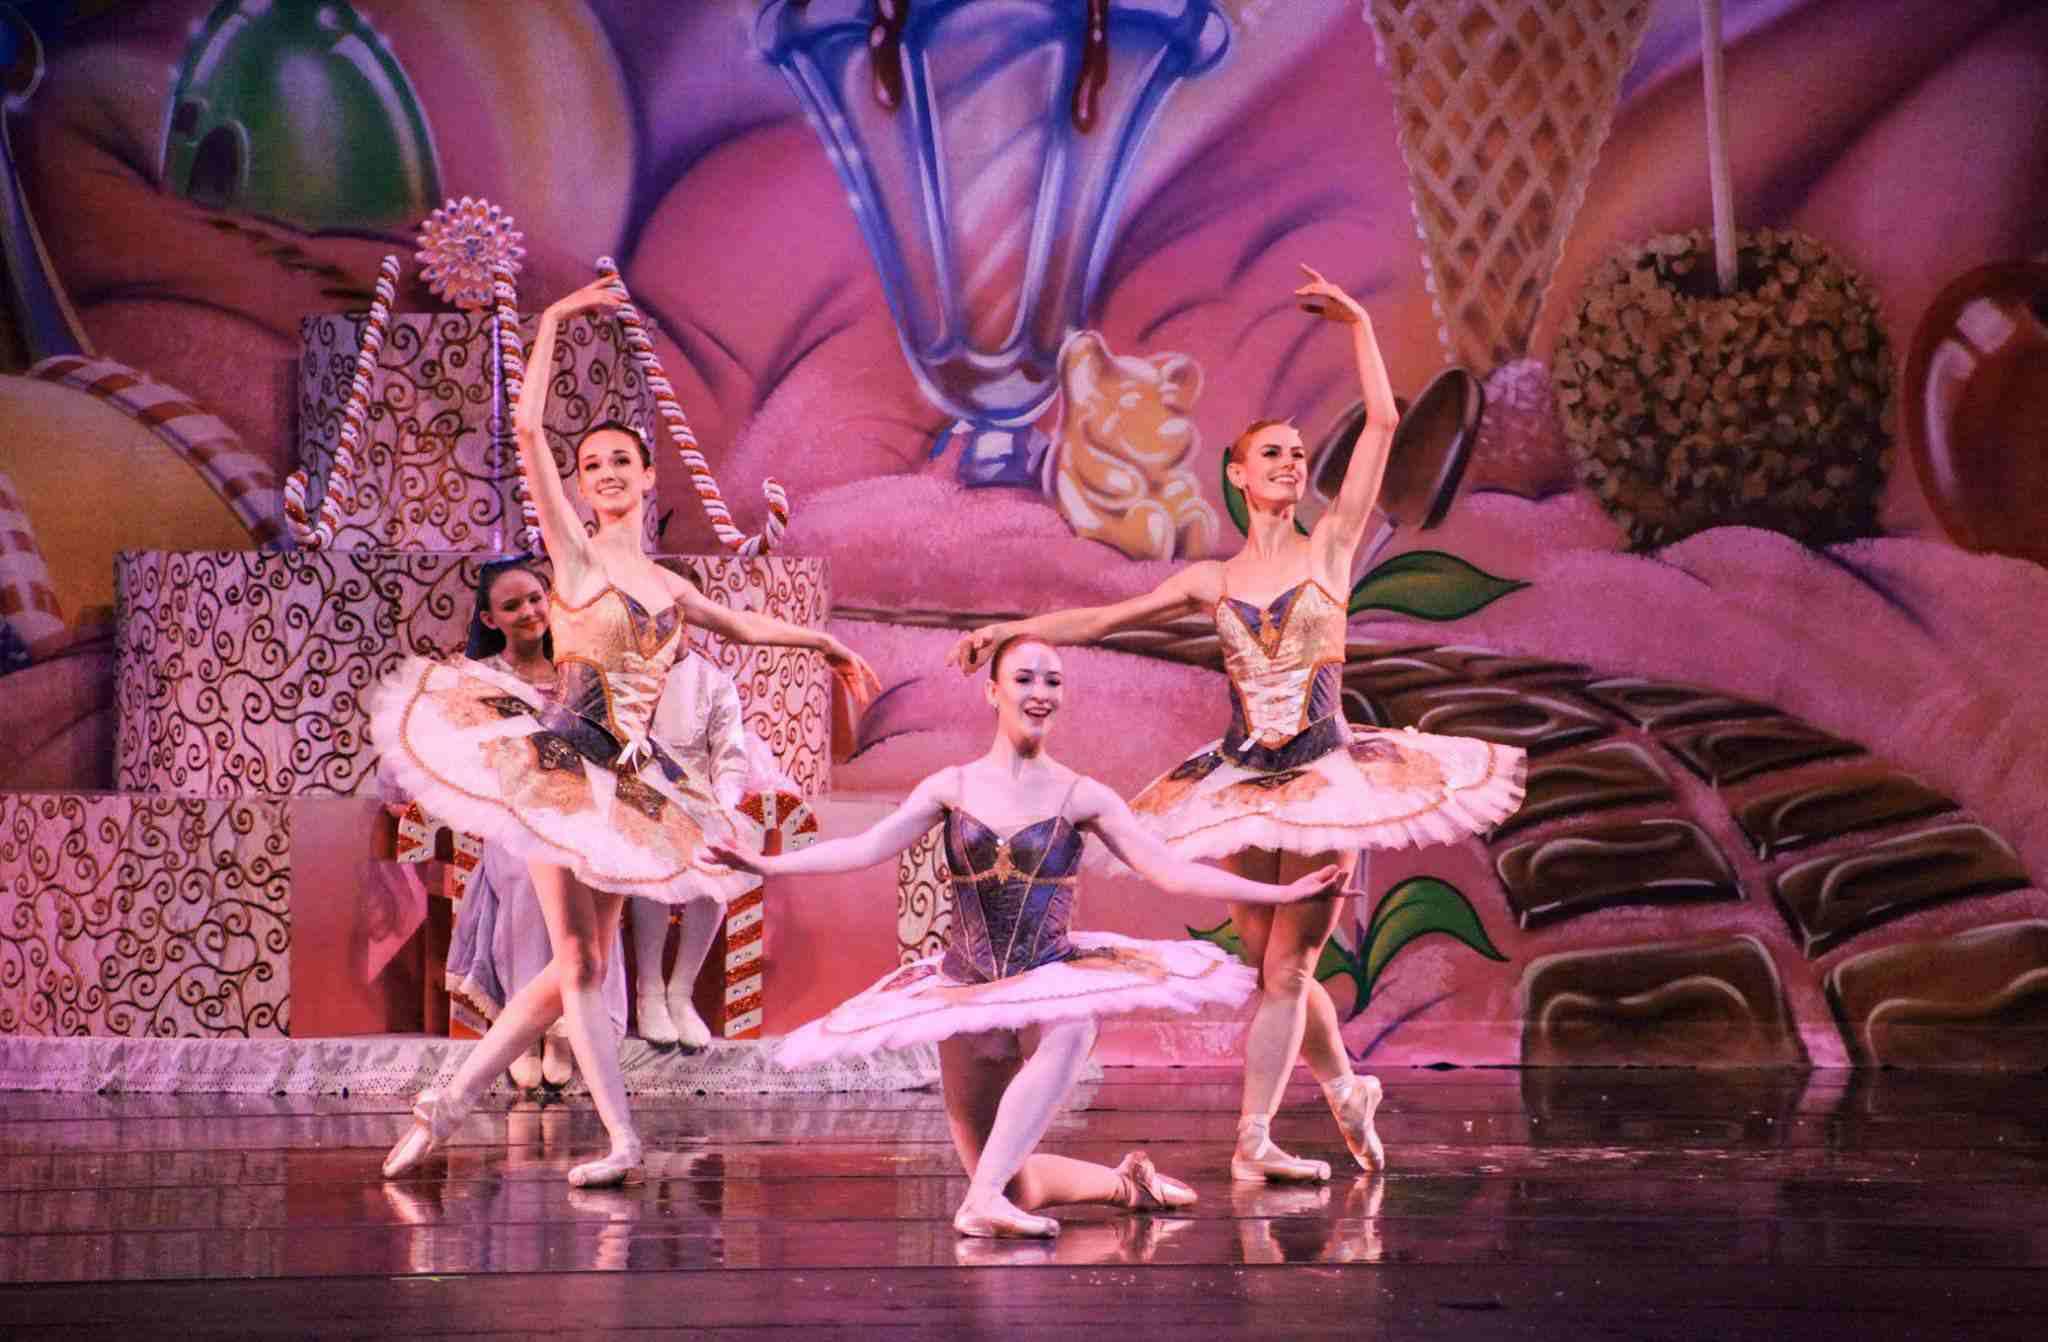 The Nutcracker performed by the Arkansas Ballet